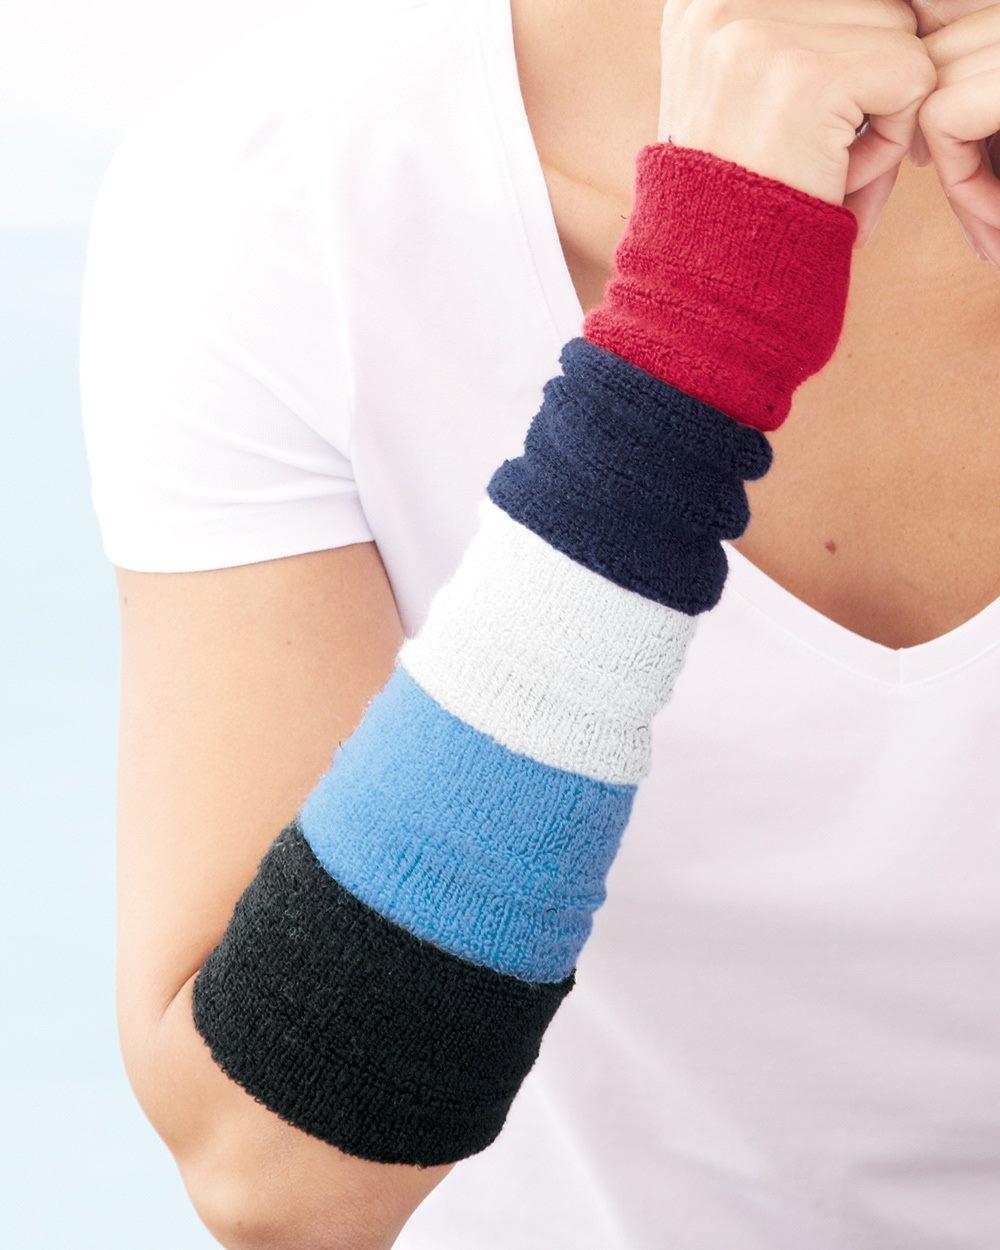 Mega Cap 1253 - Terry Cloth Wristband (Pair)